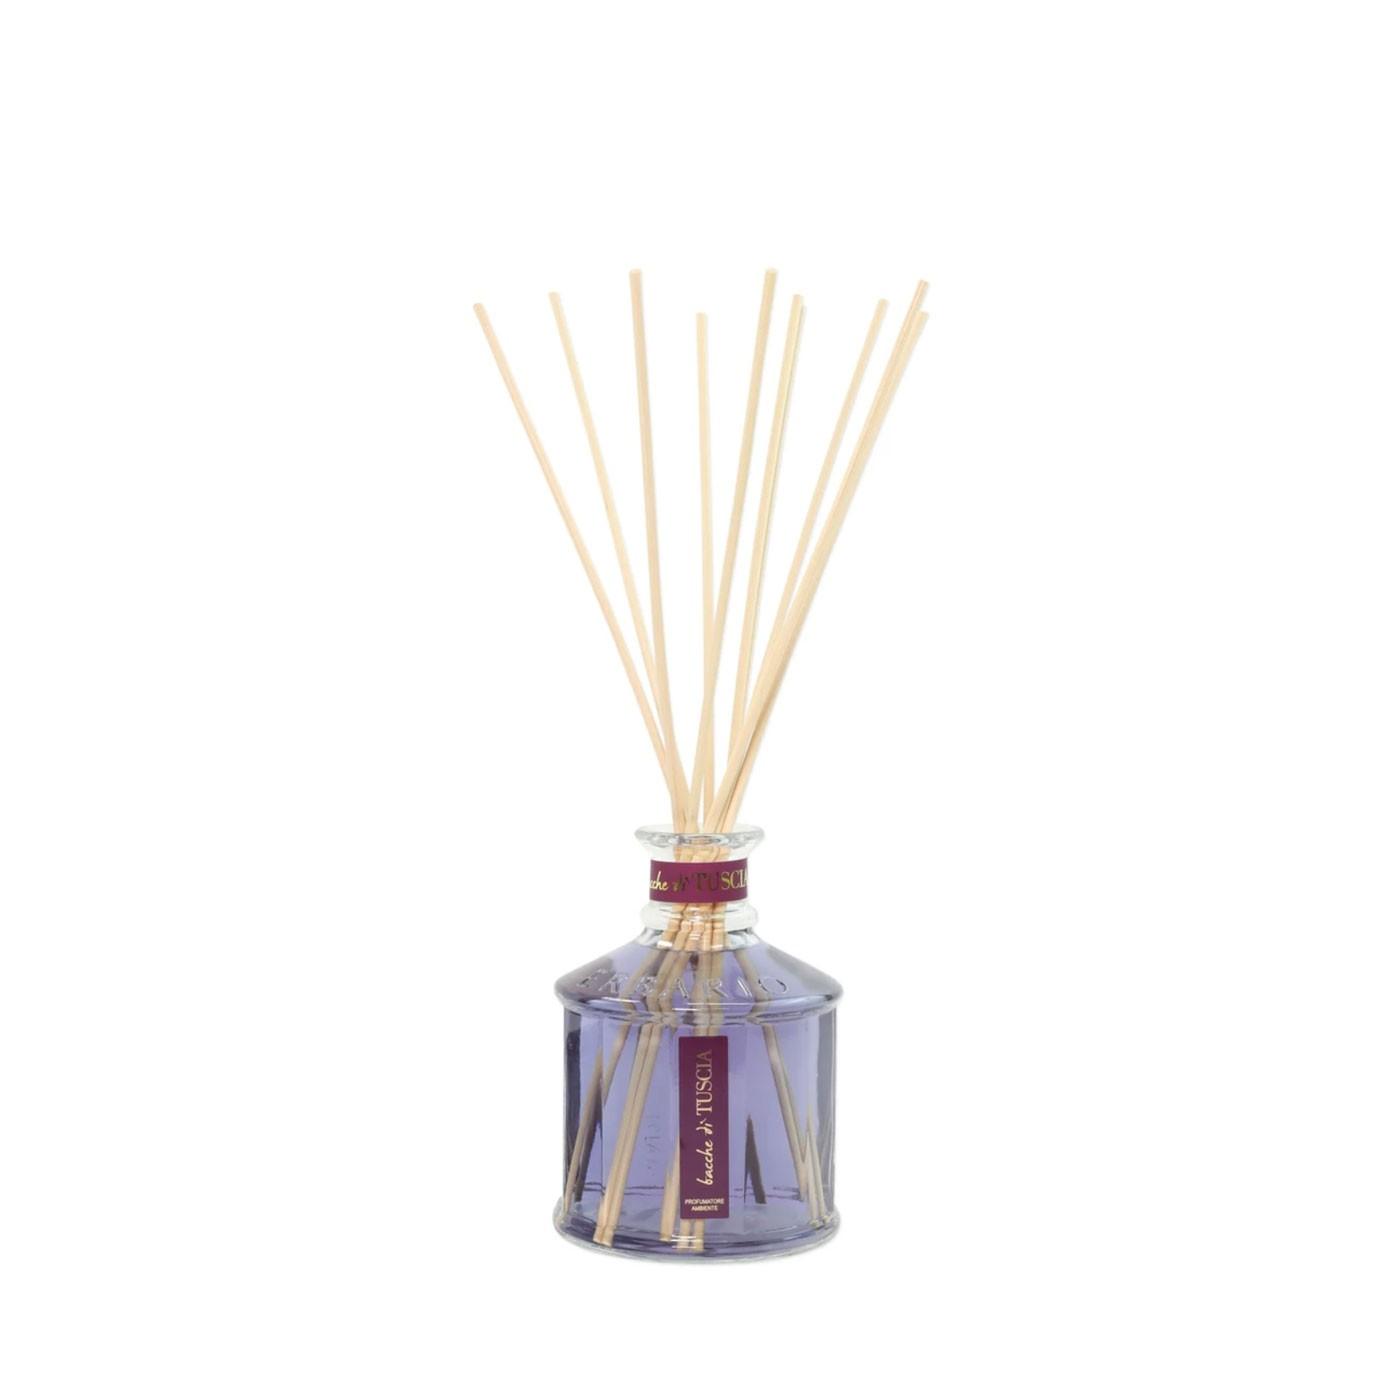 Bacche di Tuscia Fragrance Diffuser 3.4 oz - Erbario Toscano   Eataly.com